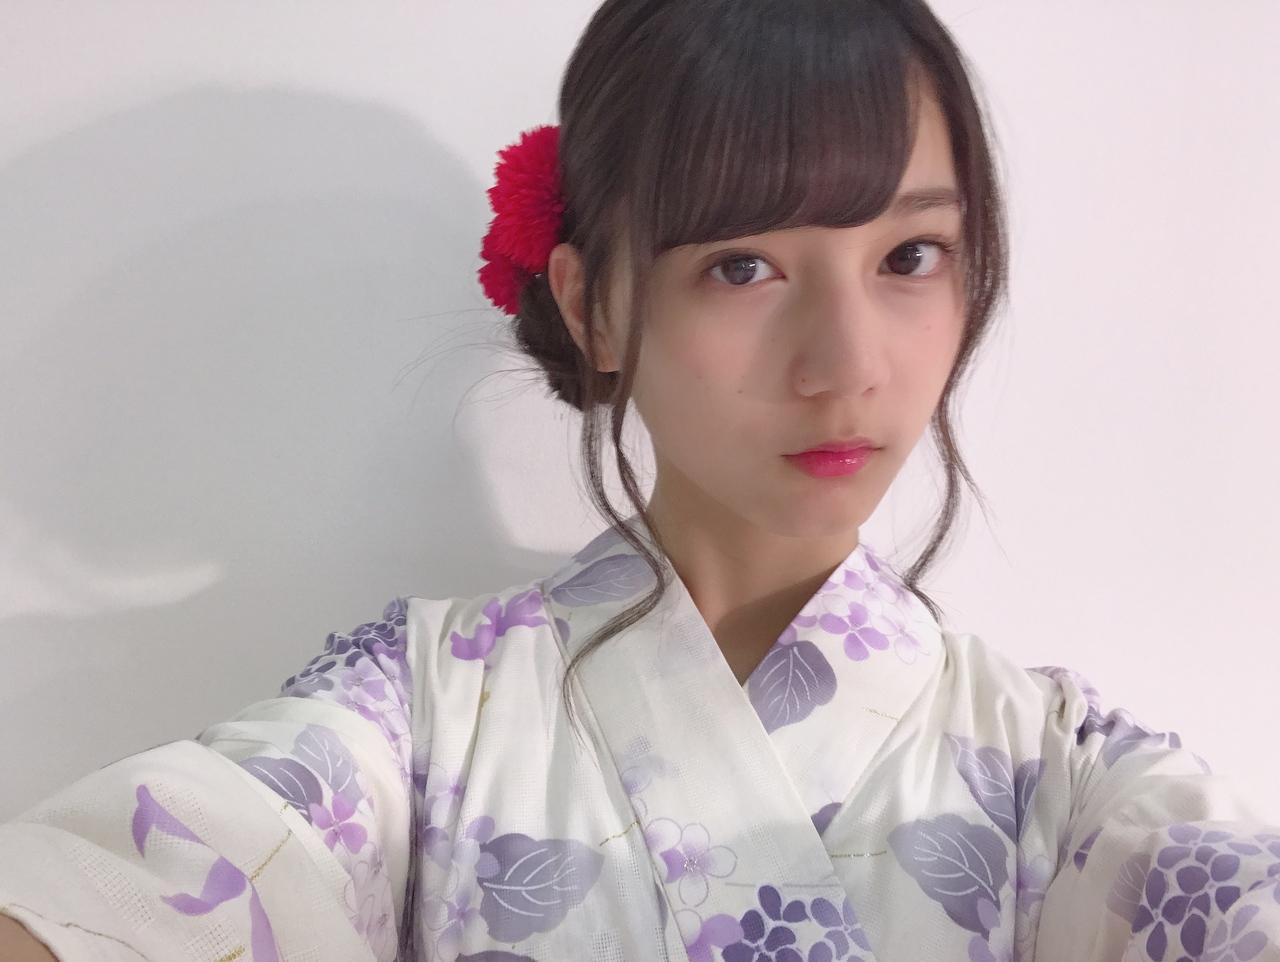 小坂菜緒 2020 浴衣 済み